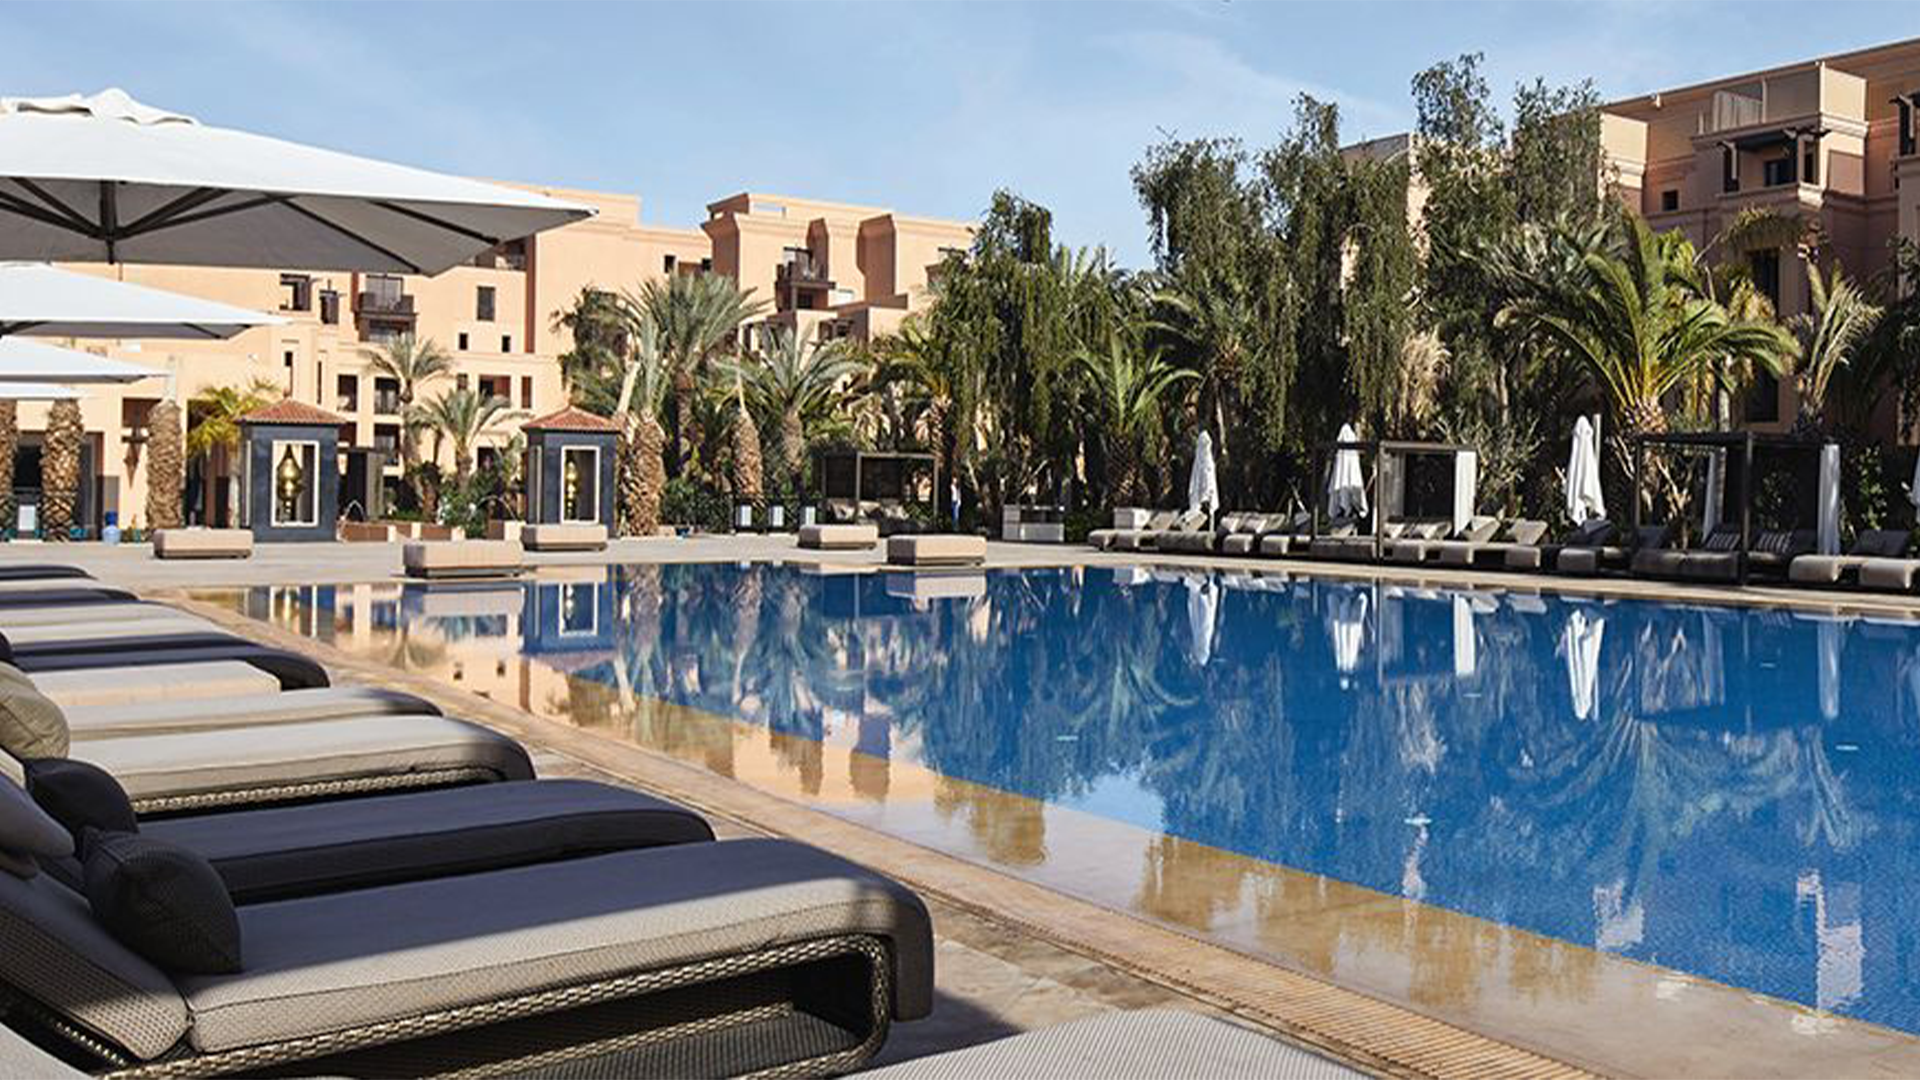 Movenpick-Mansour-Marrakech-Morocco